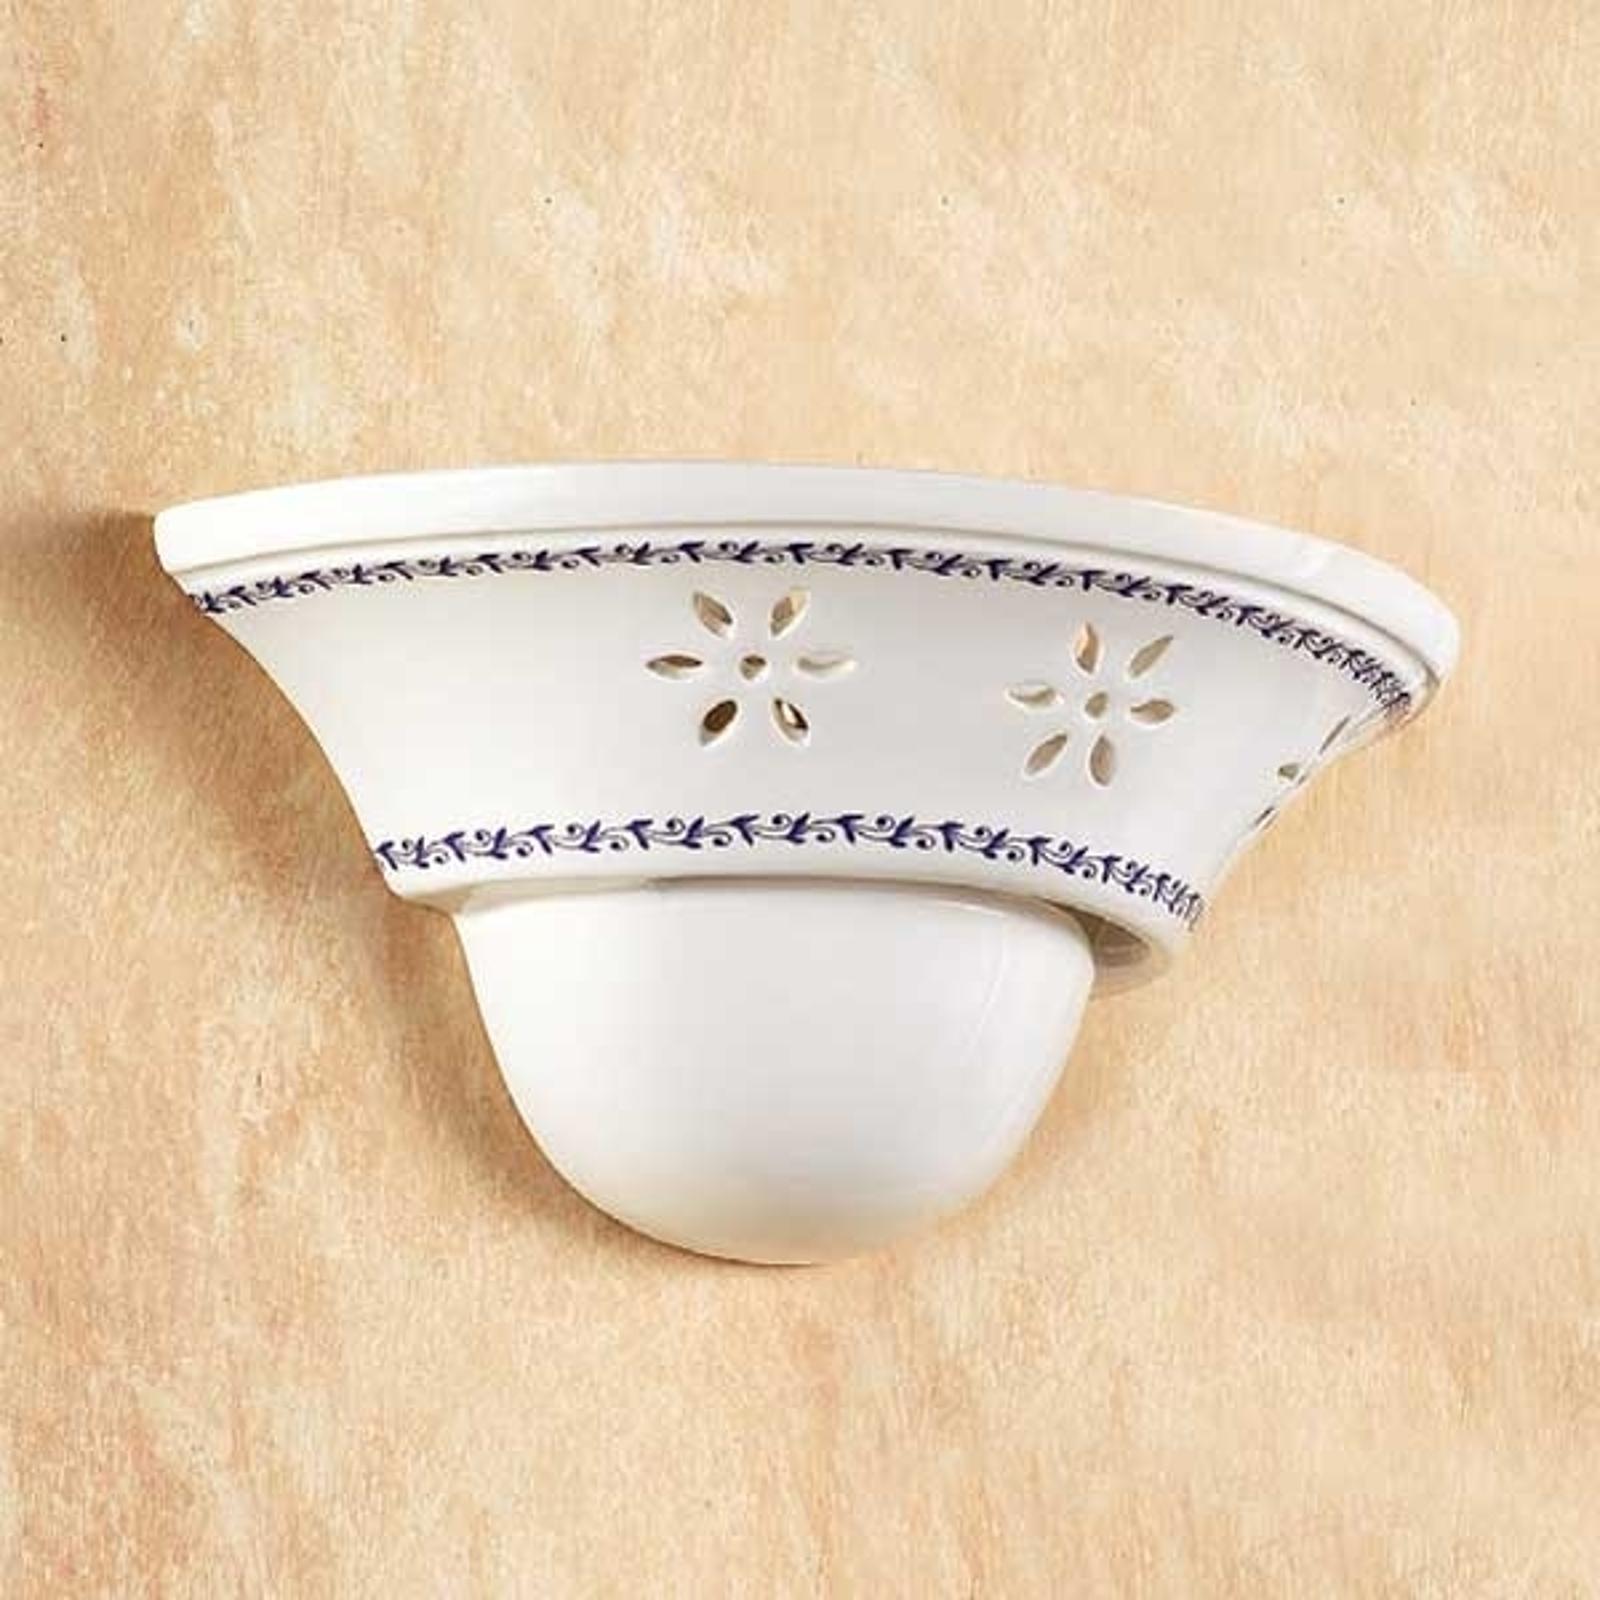 Elegant IL PUNTI wall light with a ceramic bowl_2013062_1